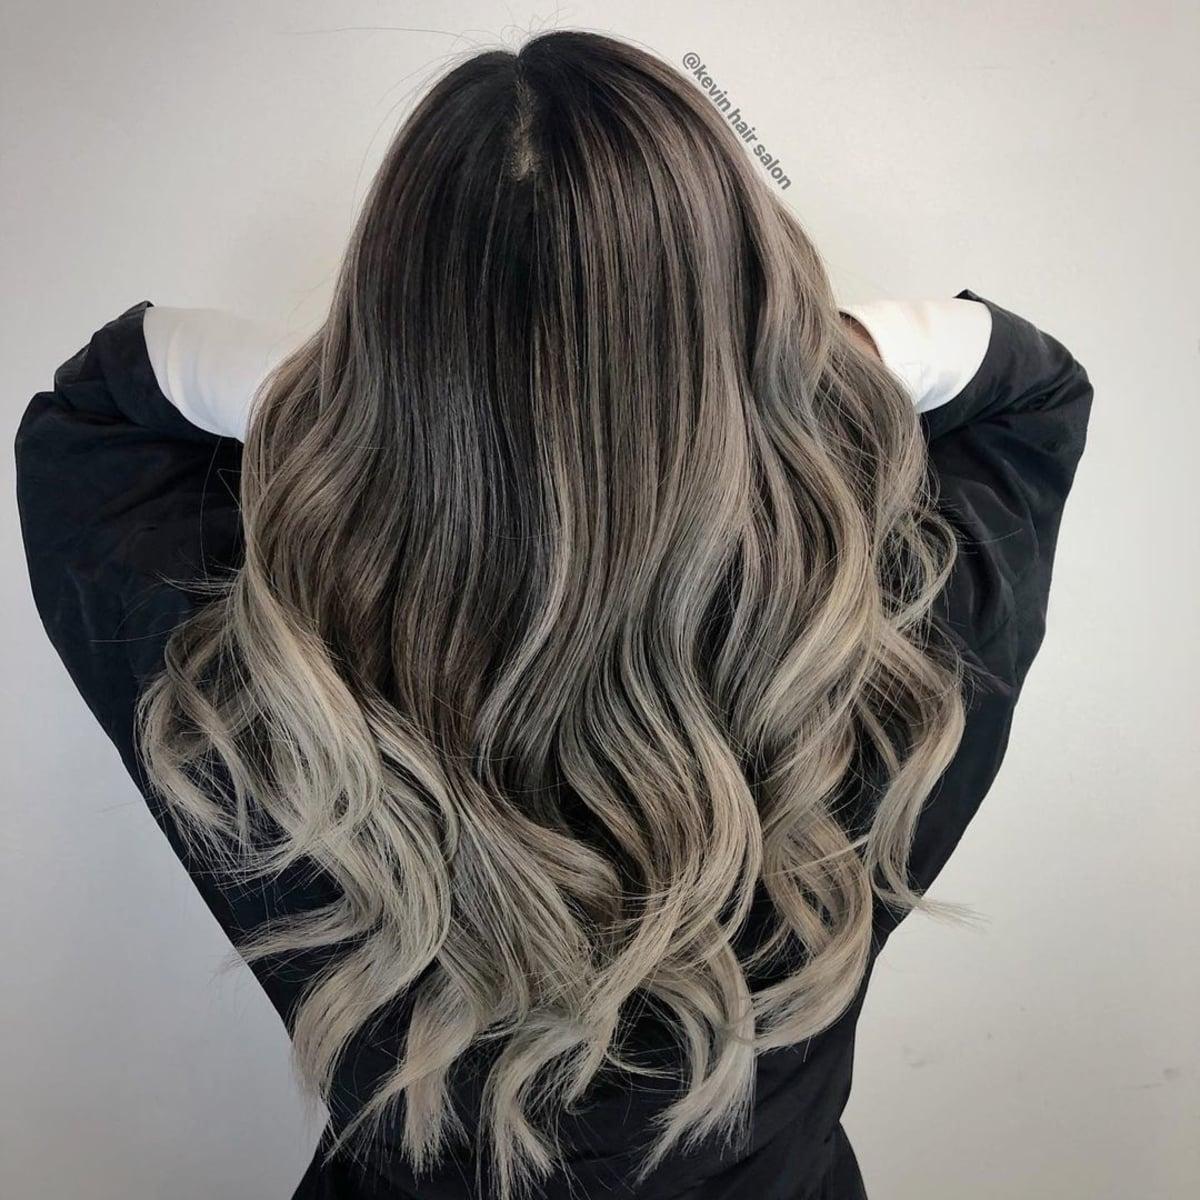 18 Stunning Ways to Get The Dark Ash Blonde Hair Color Trend